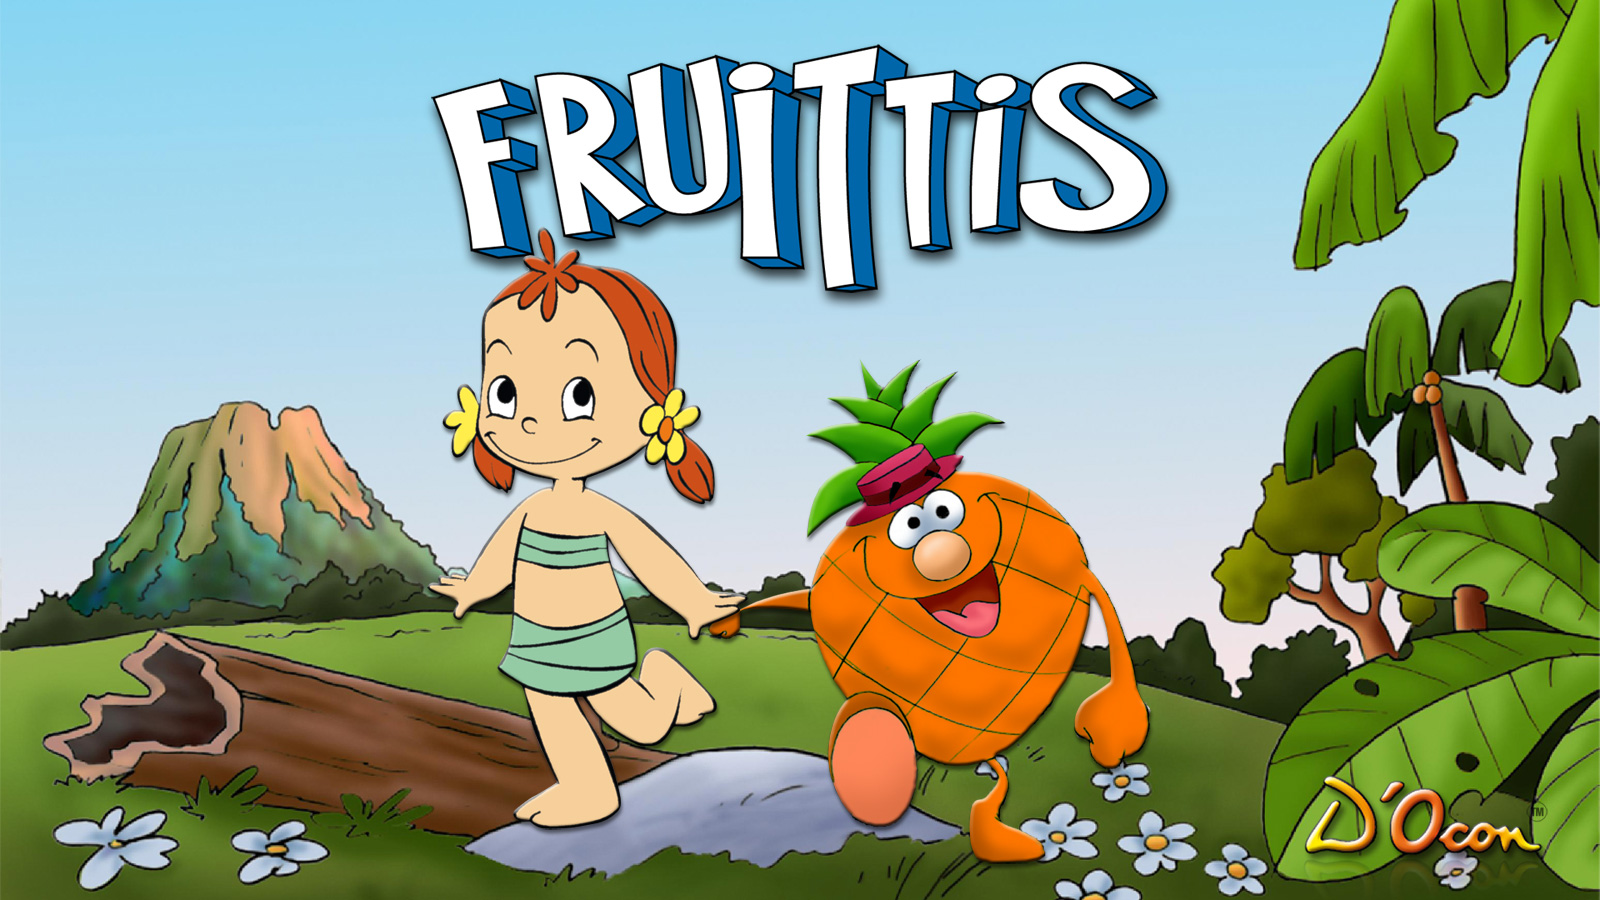 fruittis_01_1600x900